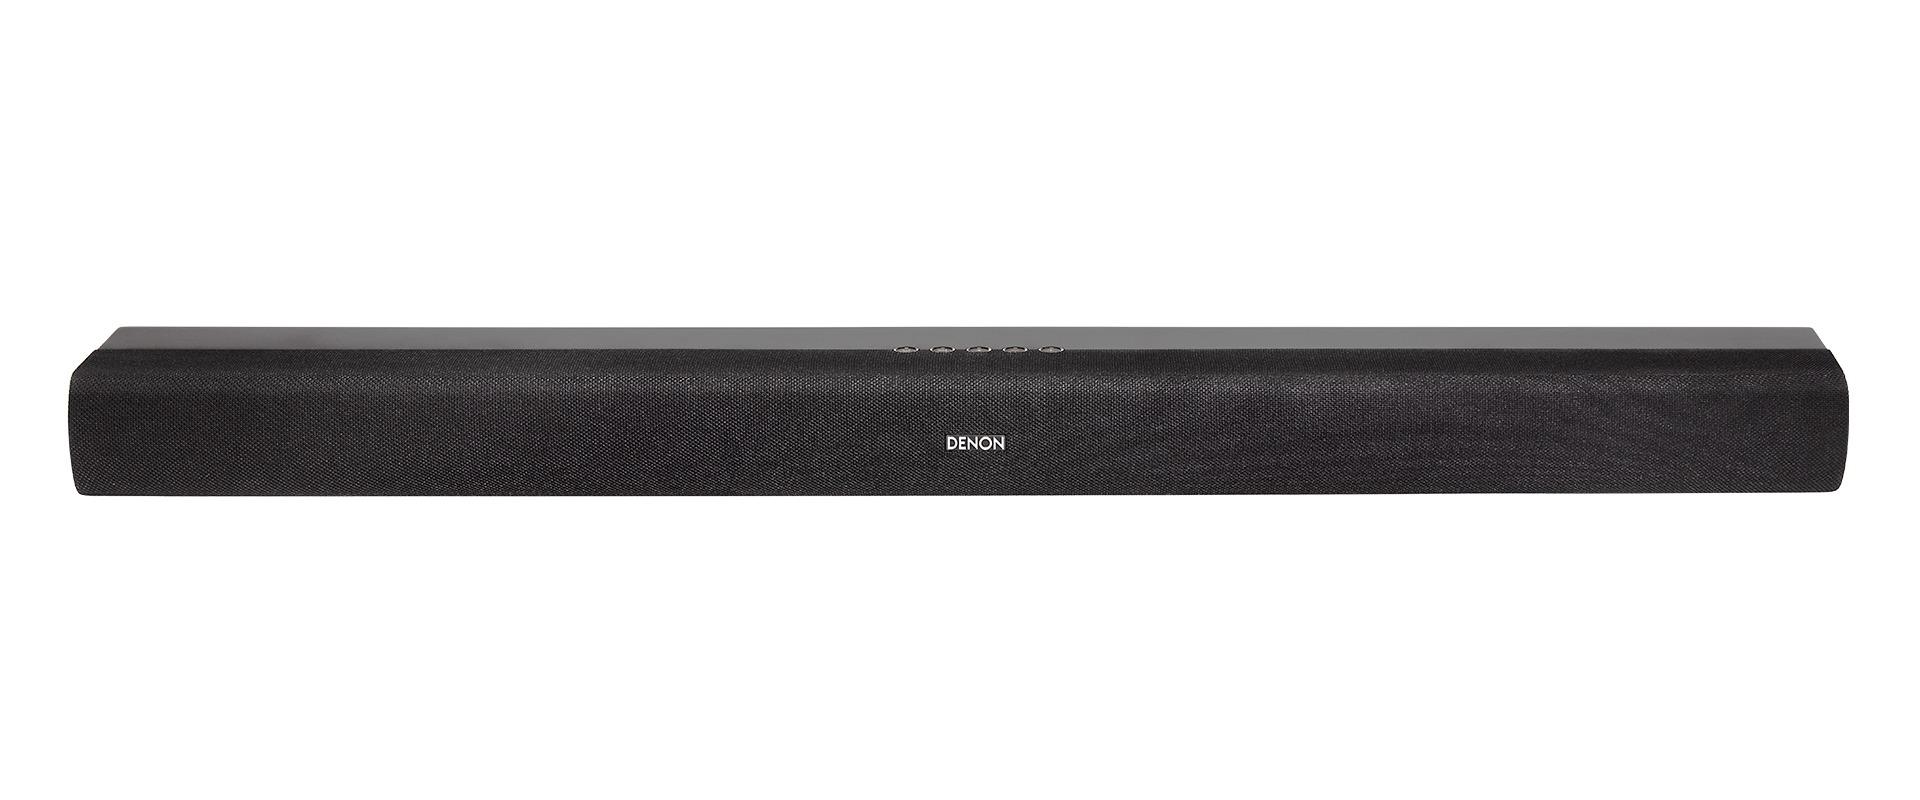 Korting Denon DHT S216 soundbar